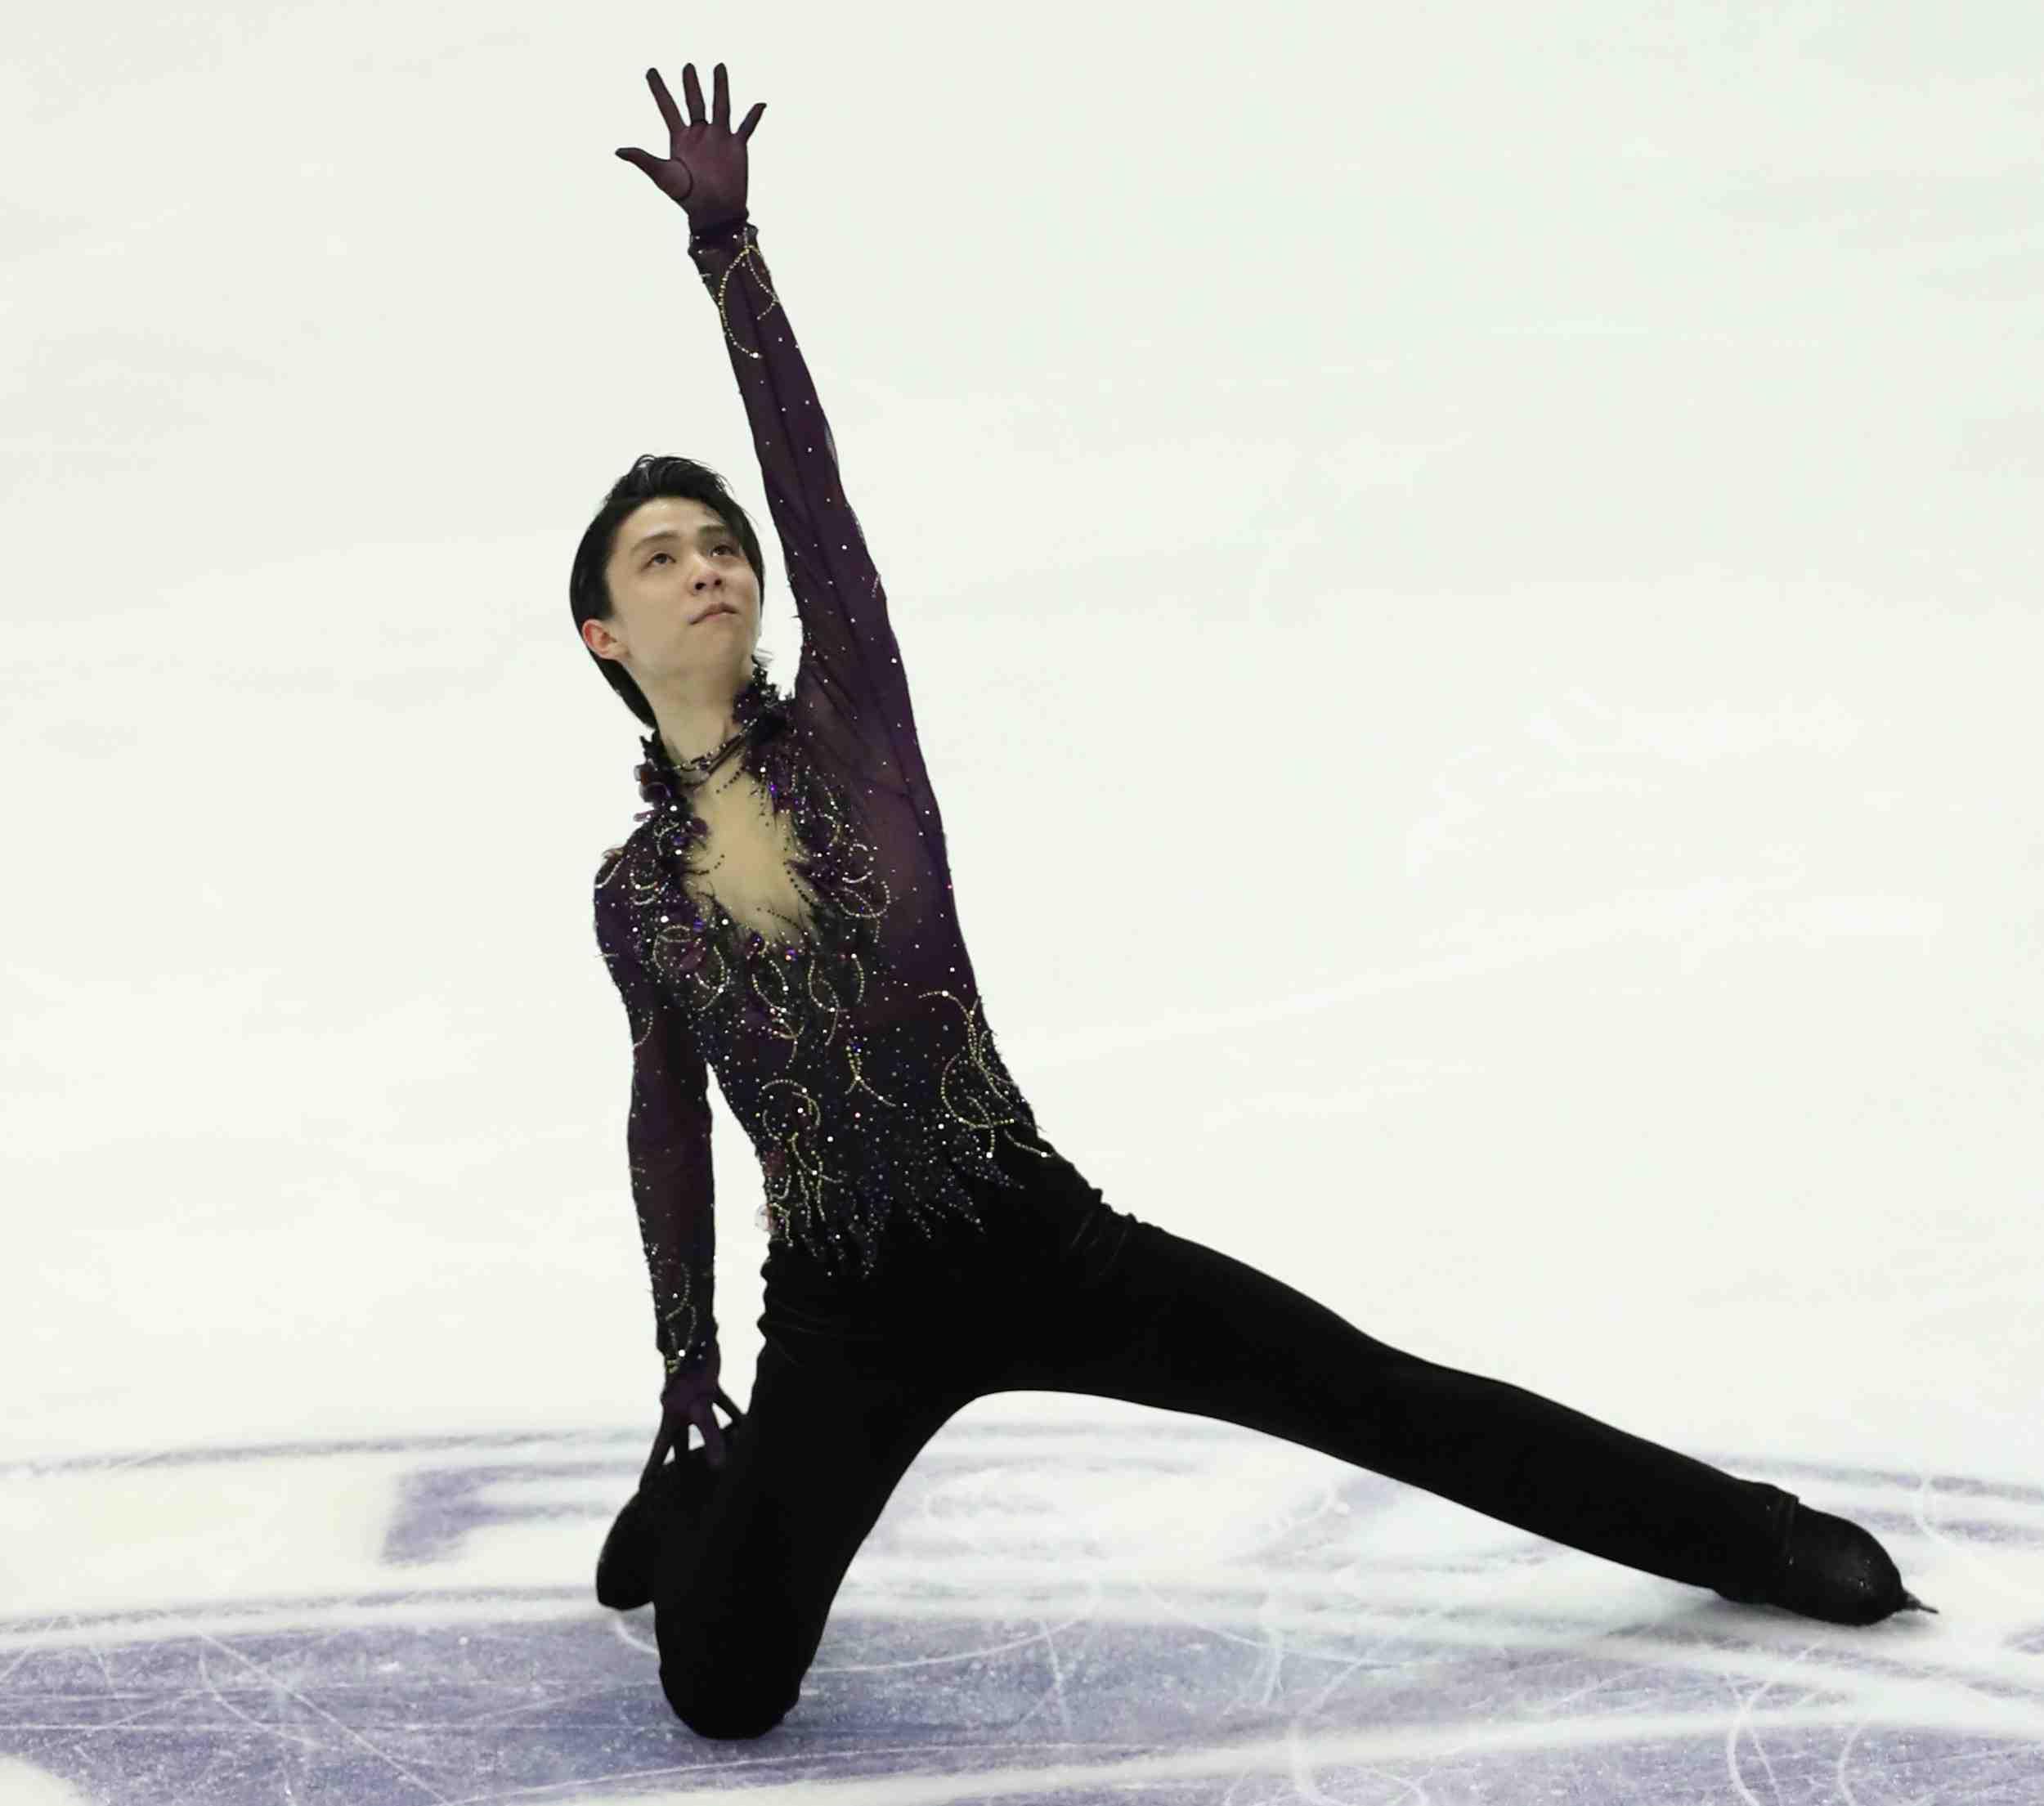 FIGURE SKATING Yuzuru Hanyu